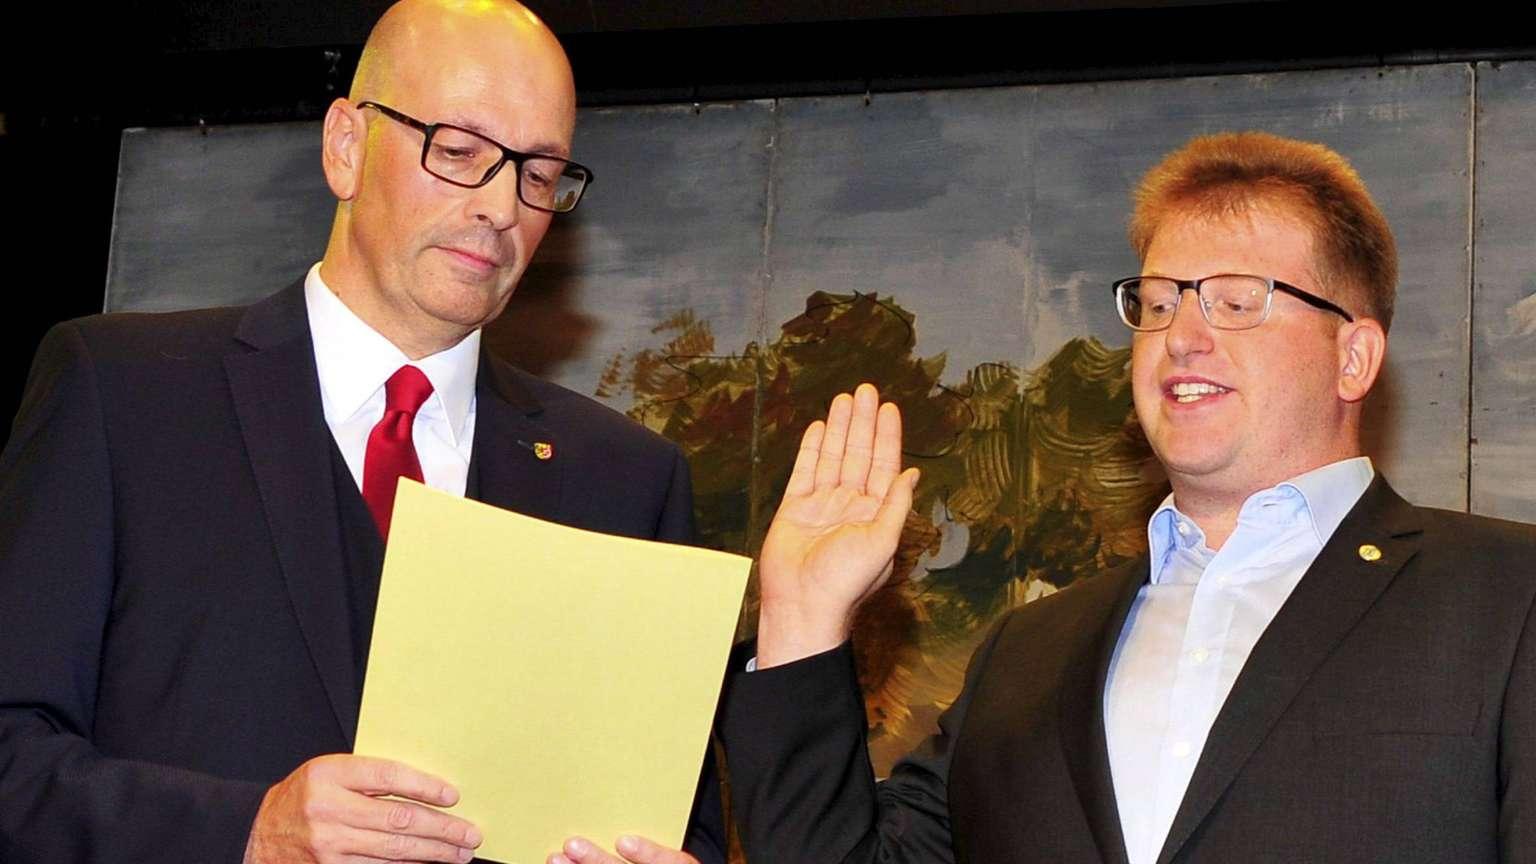 Stadtverordnetenvorsteher Dr.Richard Georgi nimmt Michael Gerheim den Amtseid ab